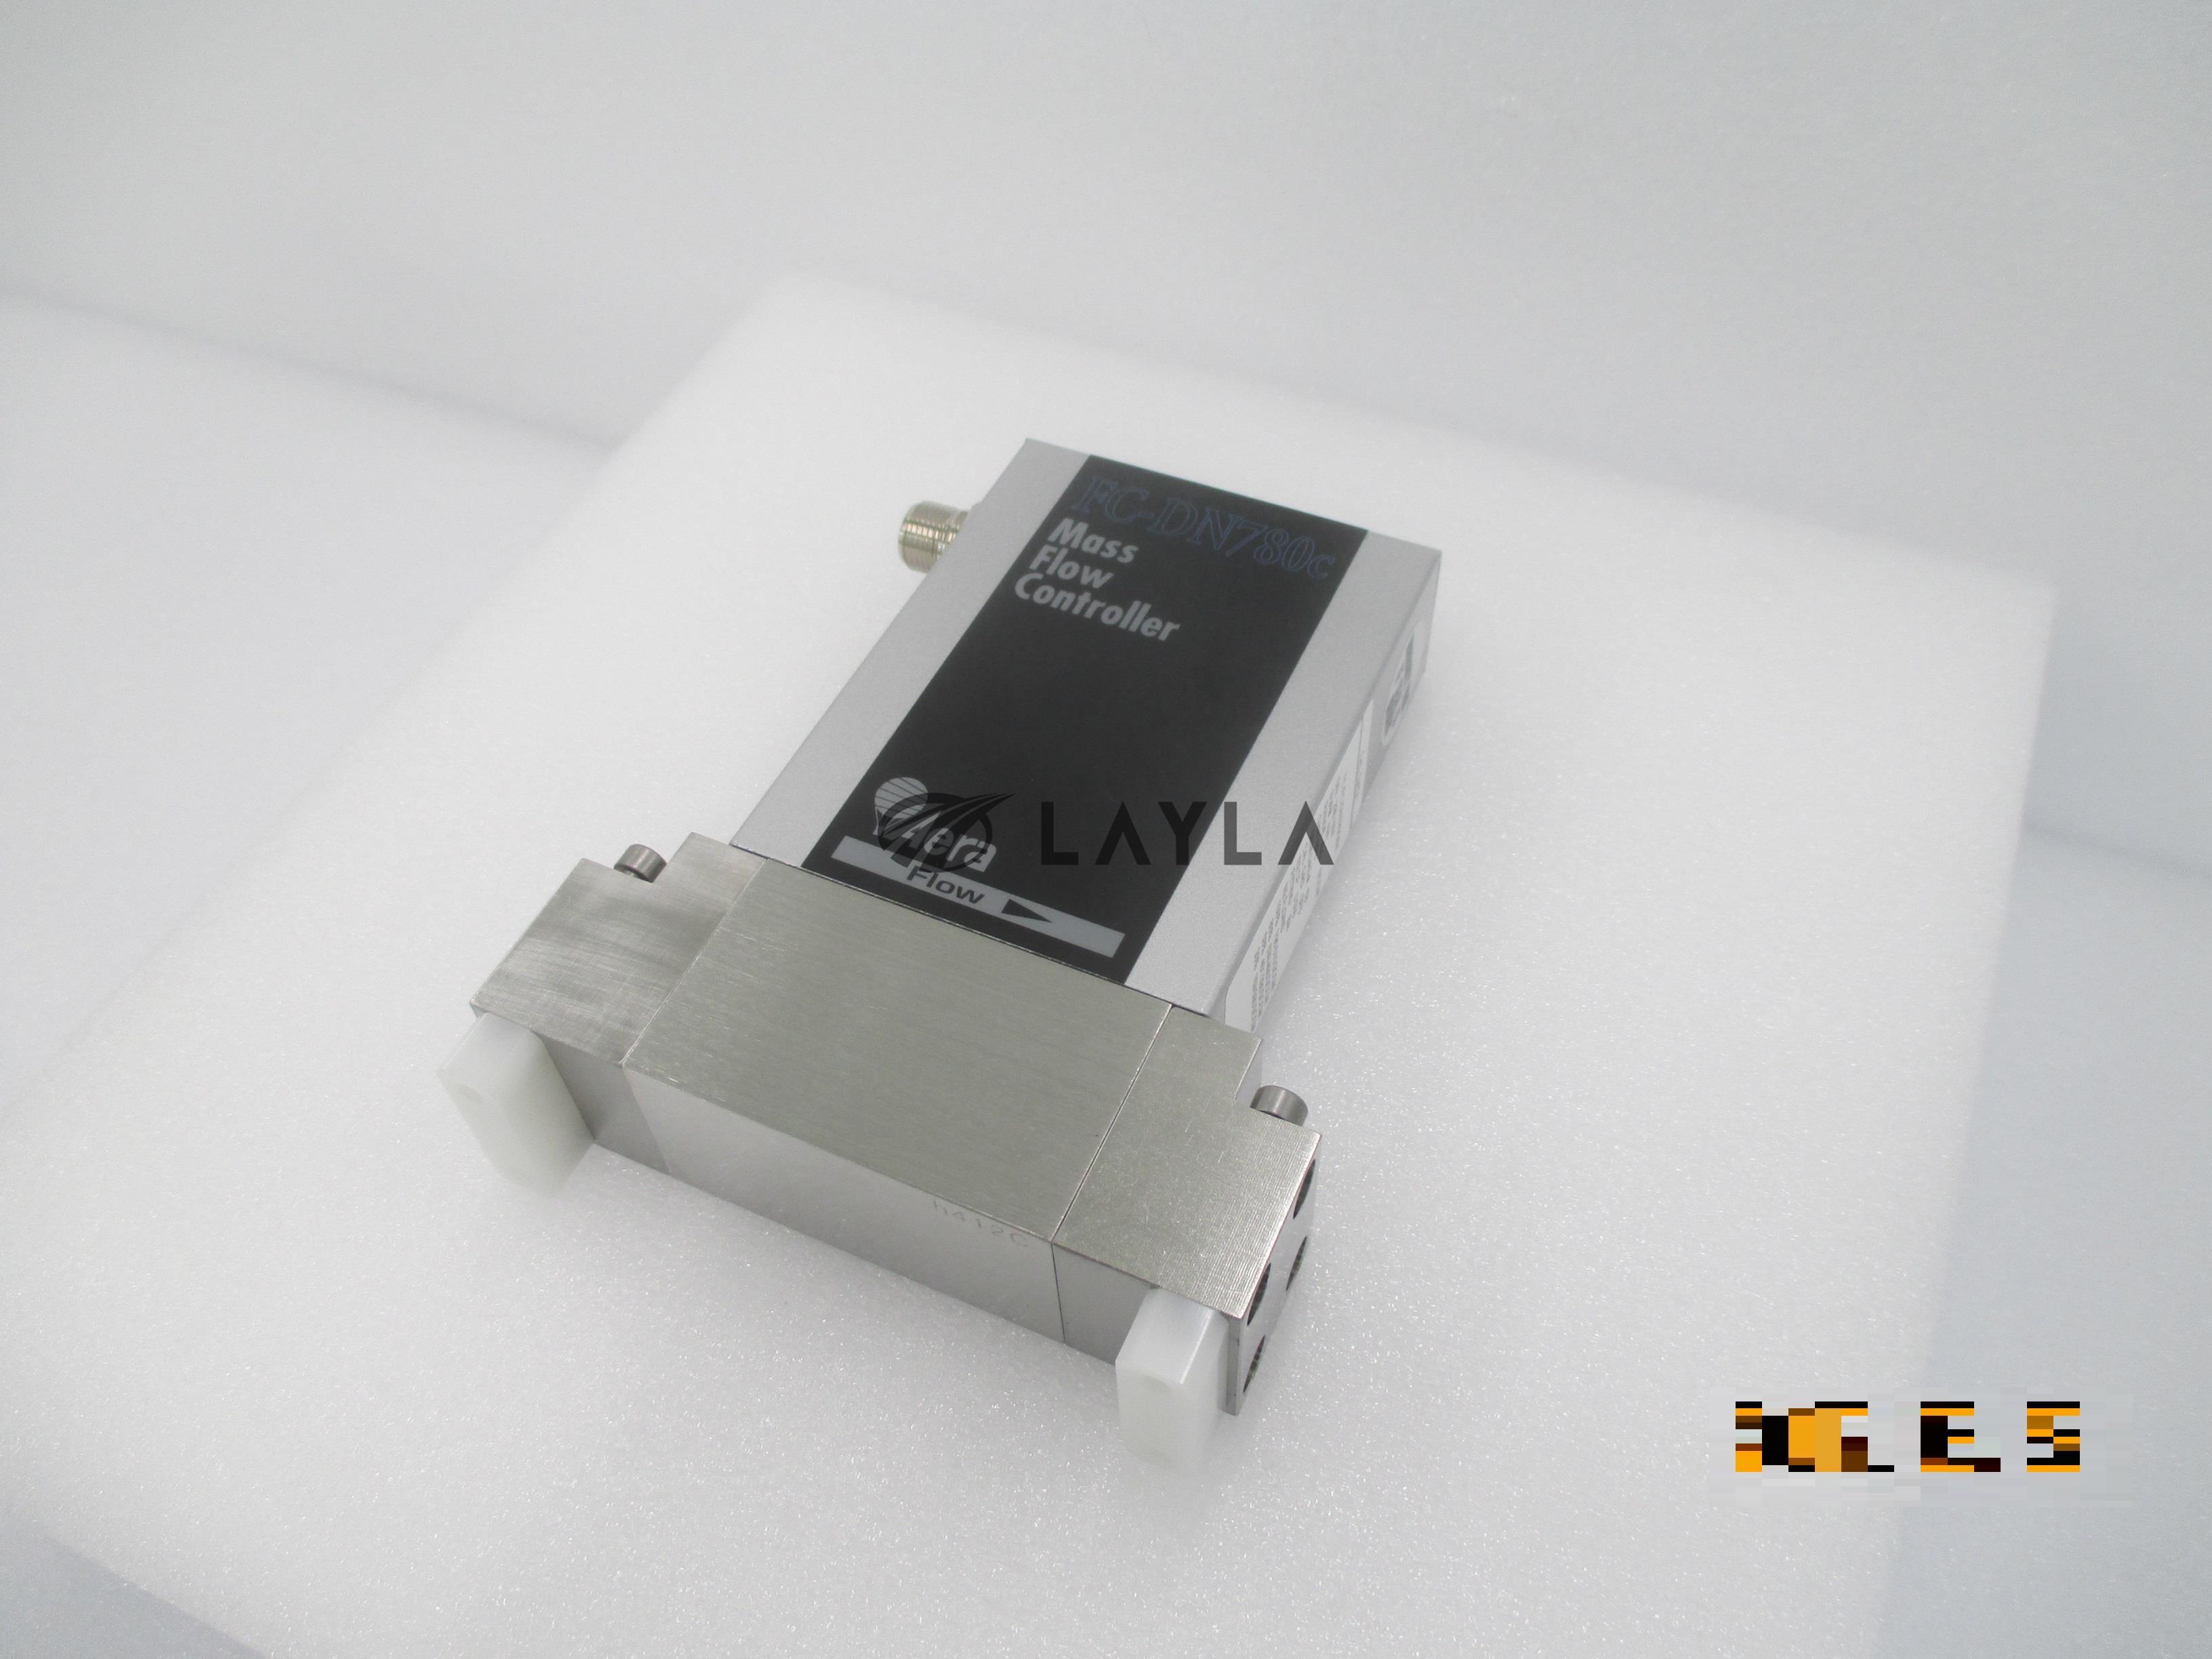 FC-DN-780C-BANF3400SCCM//MFC FC-DN-780C-BA NF3 400SCCM//_04